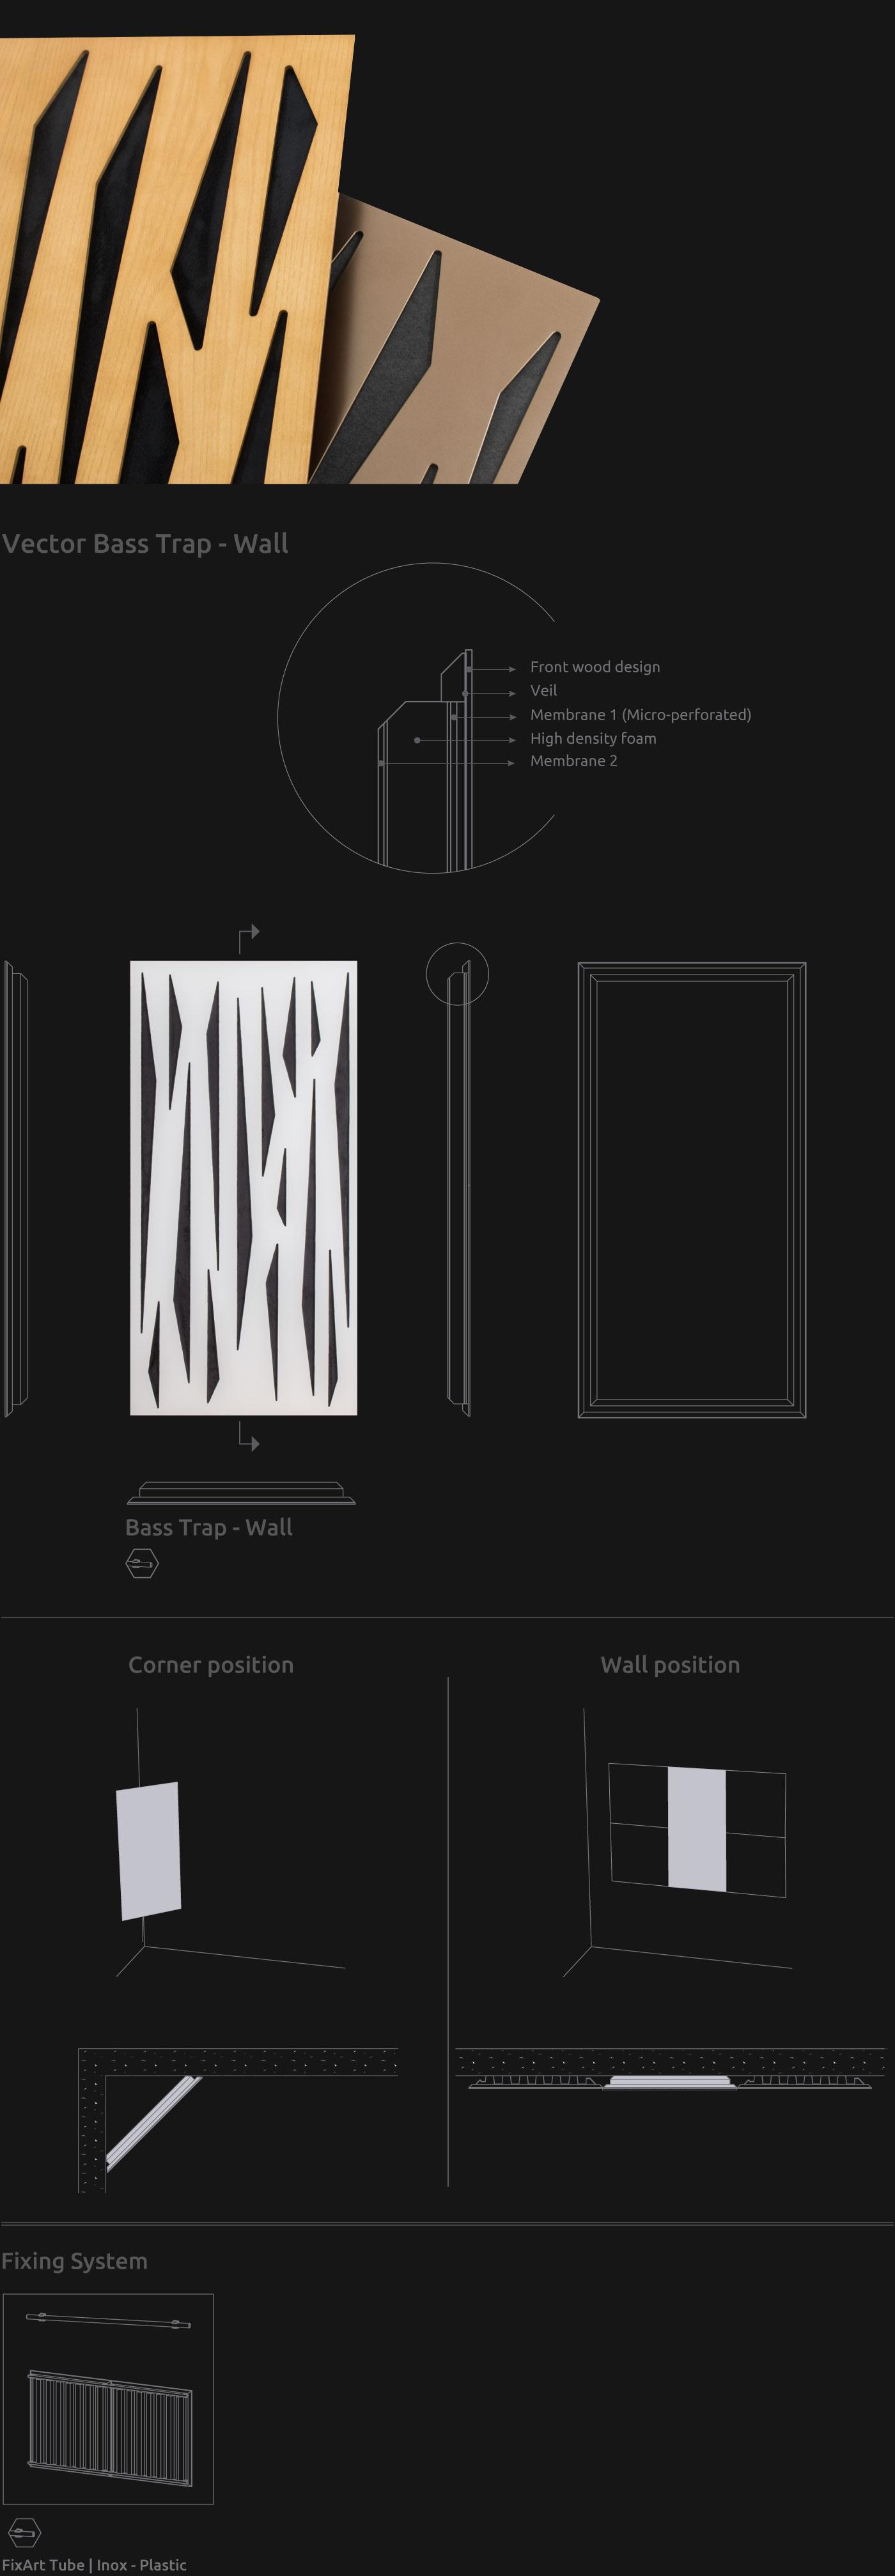 Artnovion product vector doble w bass trap wall be7d0b2235